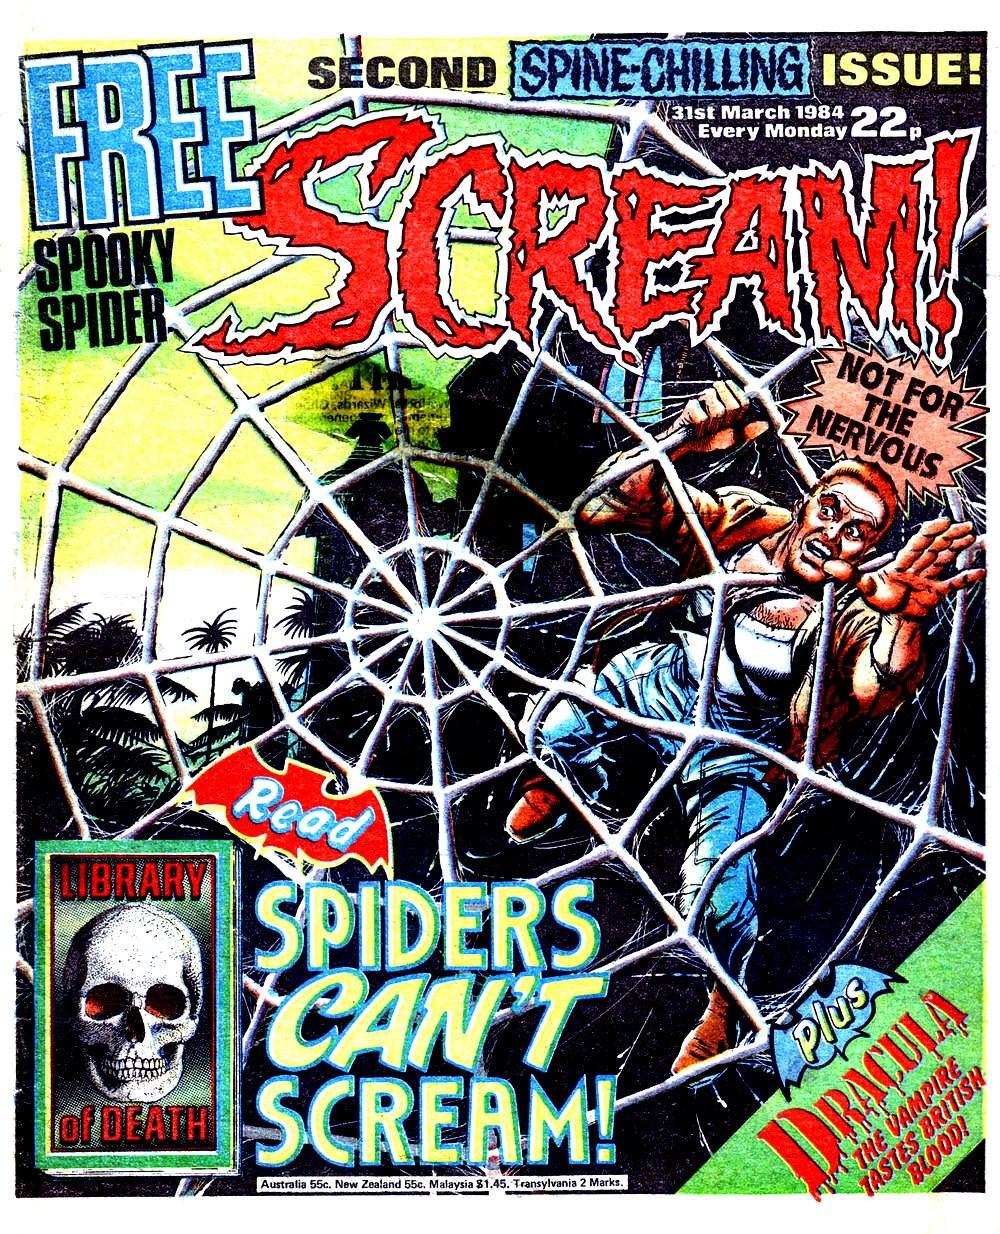 THE COBWEBBED ROOM: 'SCREAM' Comic